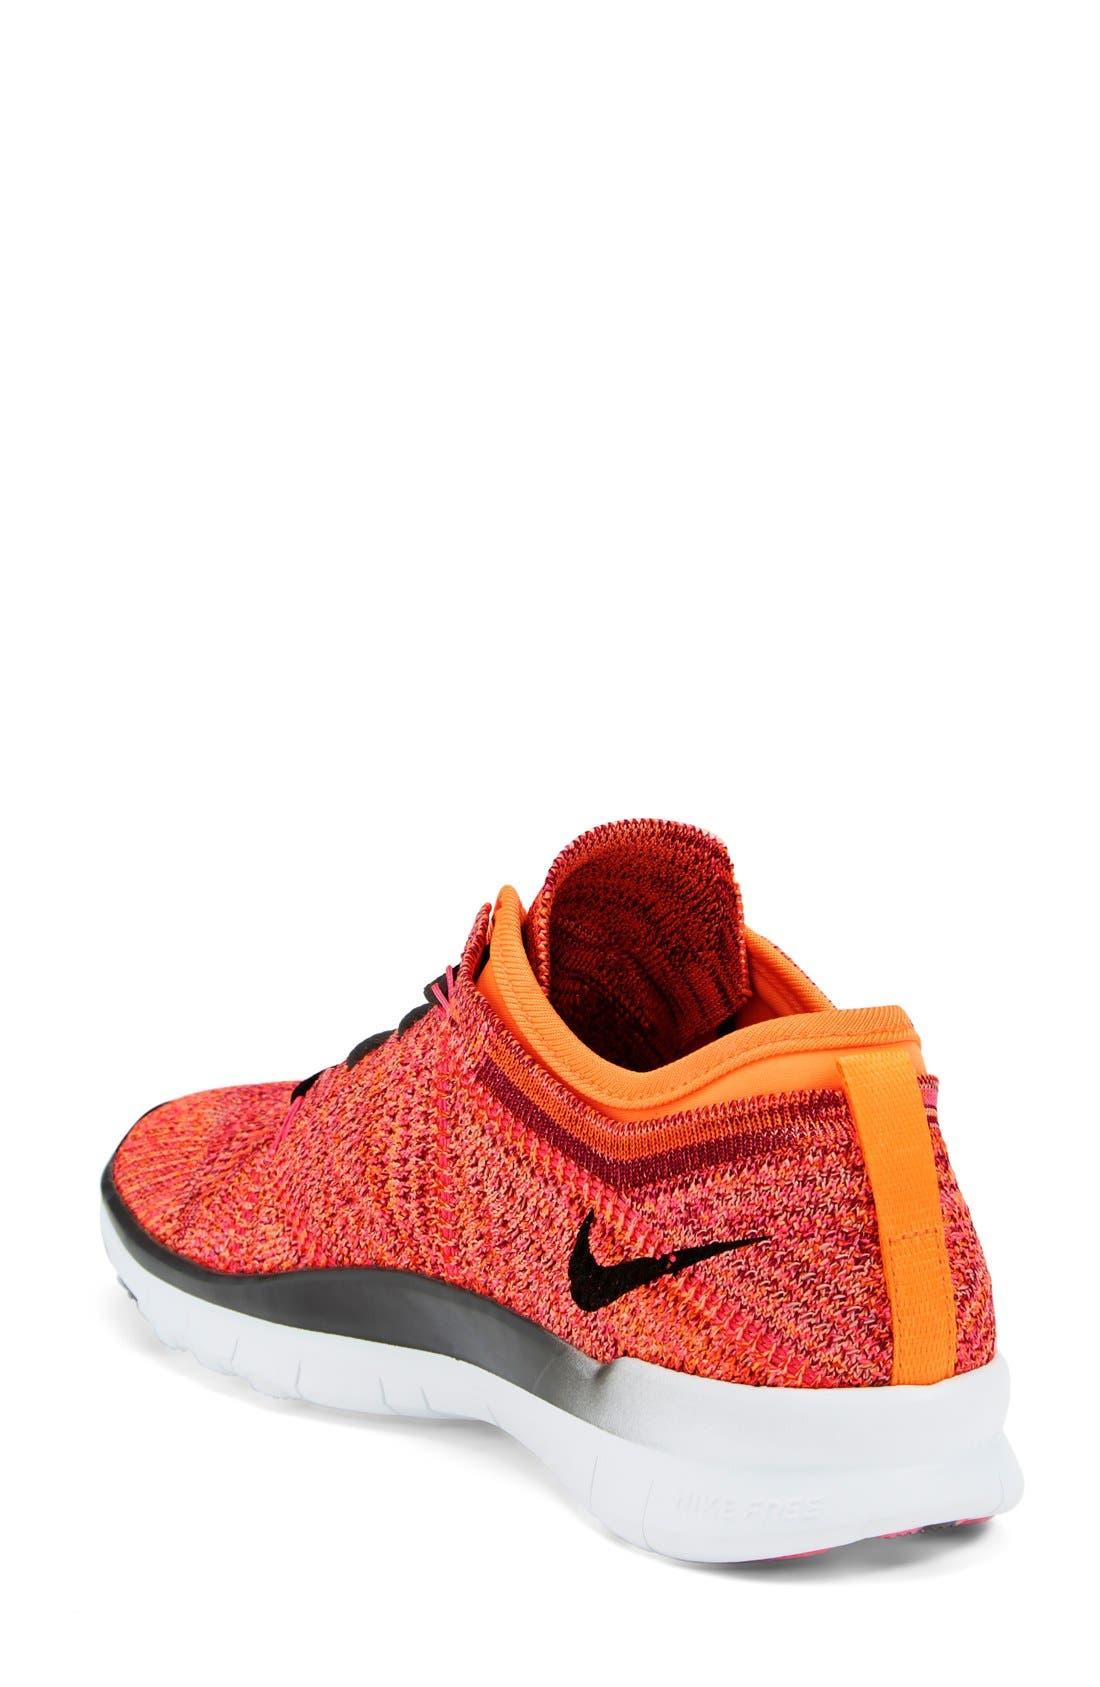 ,                             'Free Flyknit 5.0 TR' Training Shoe,                             Alternate thumbnail 57, color,                             800